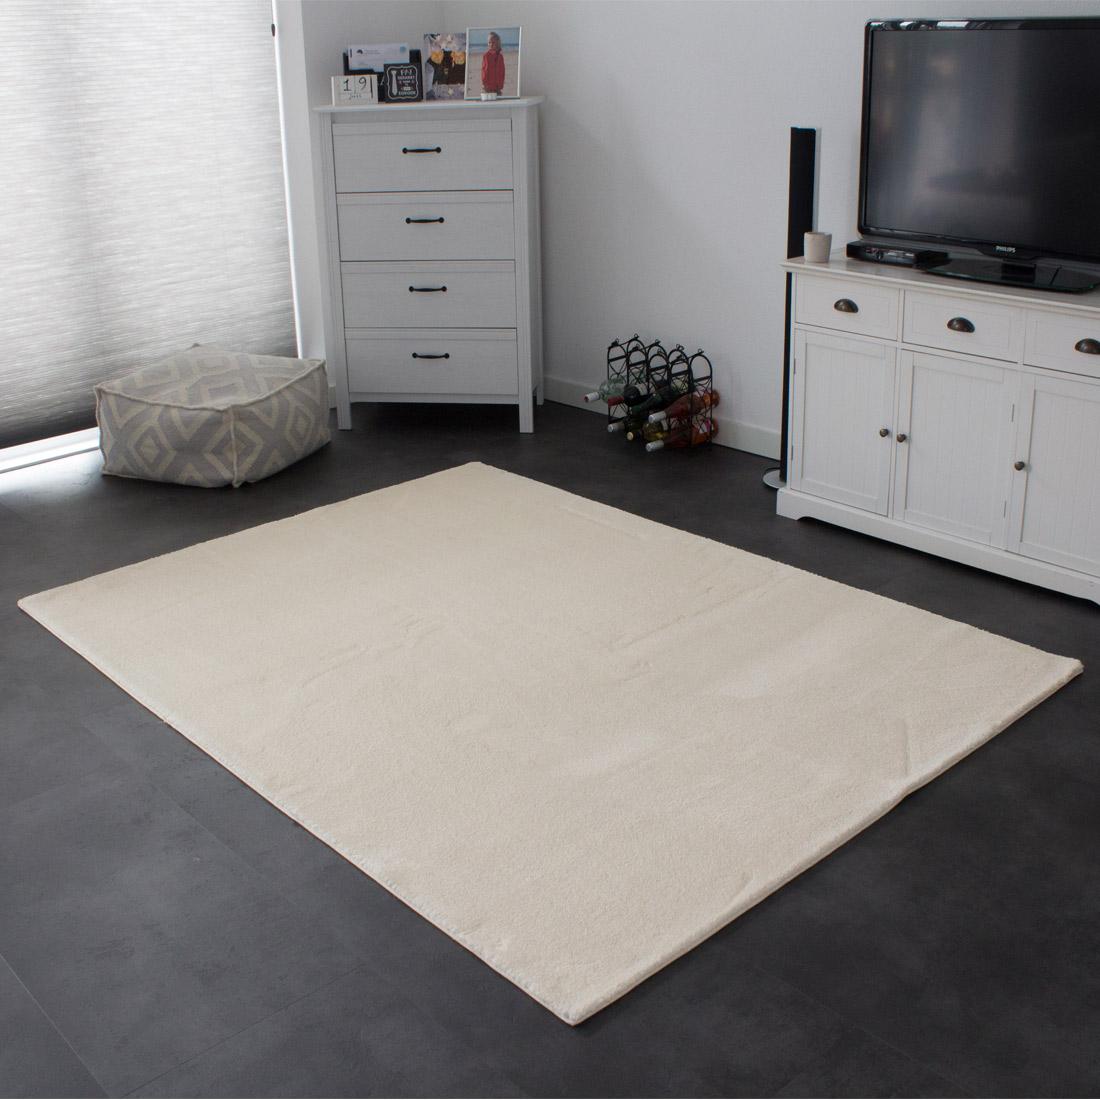 Vloerkleed Xilento Soft Bloesem | 200 x 300 cm